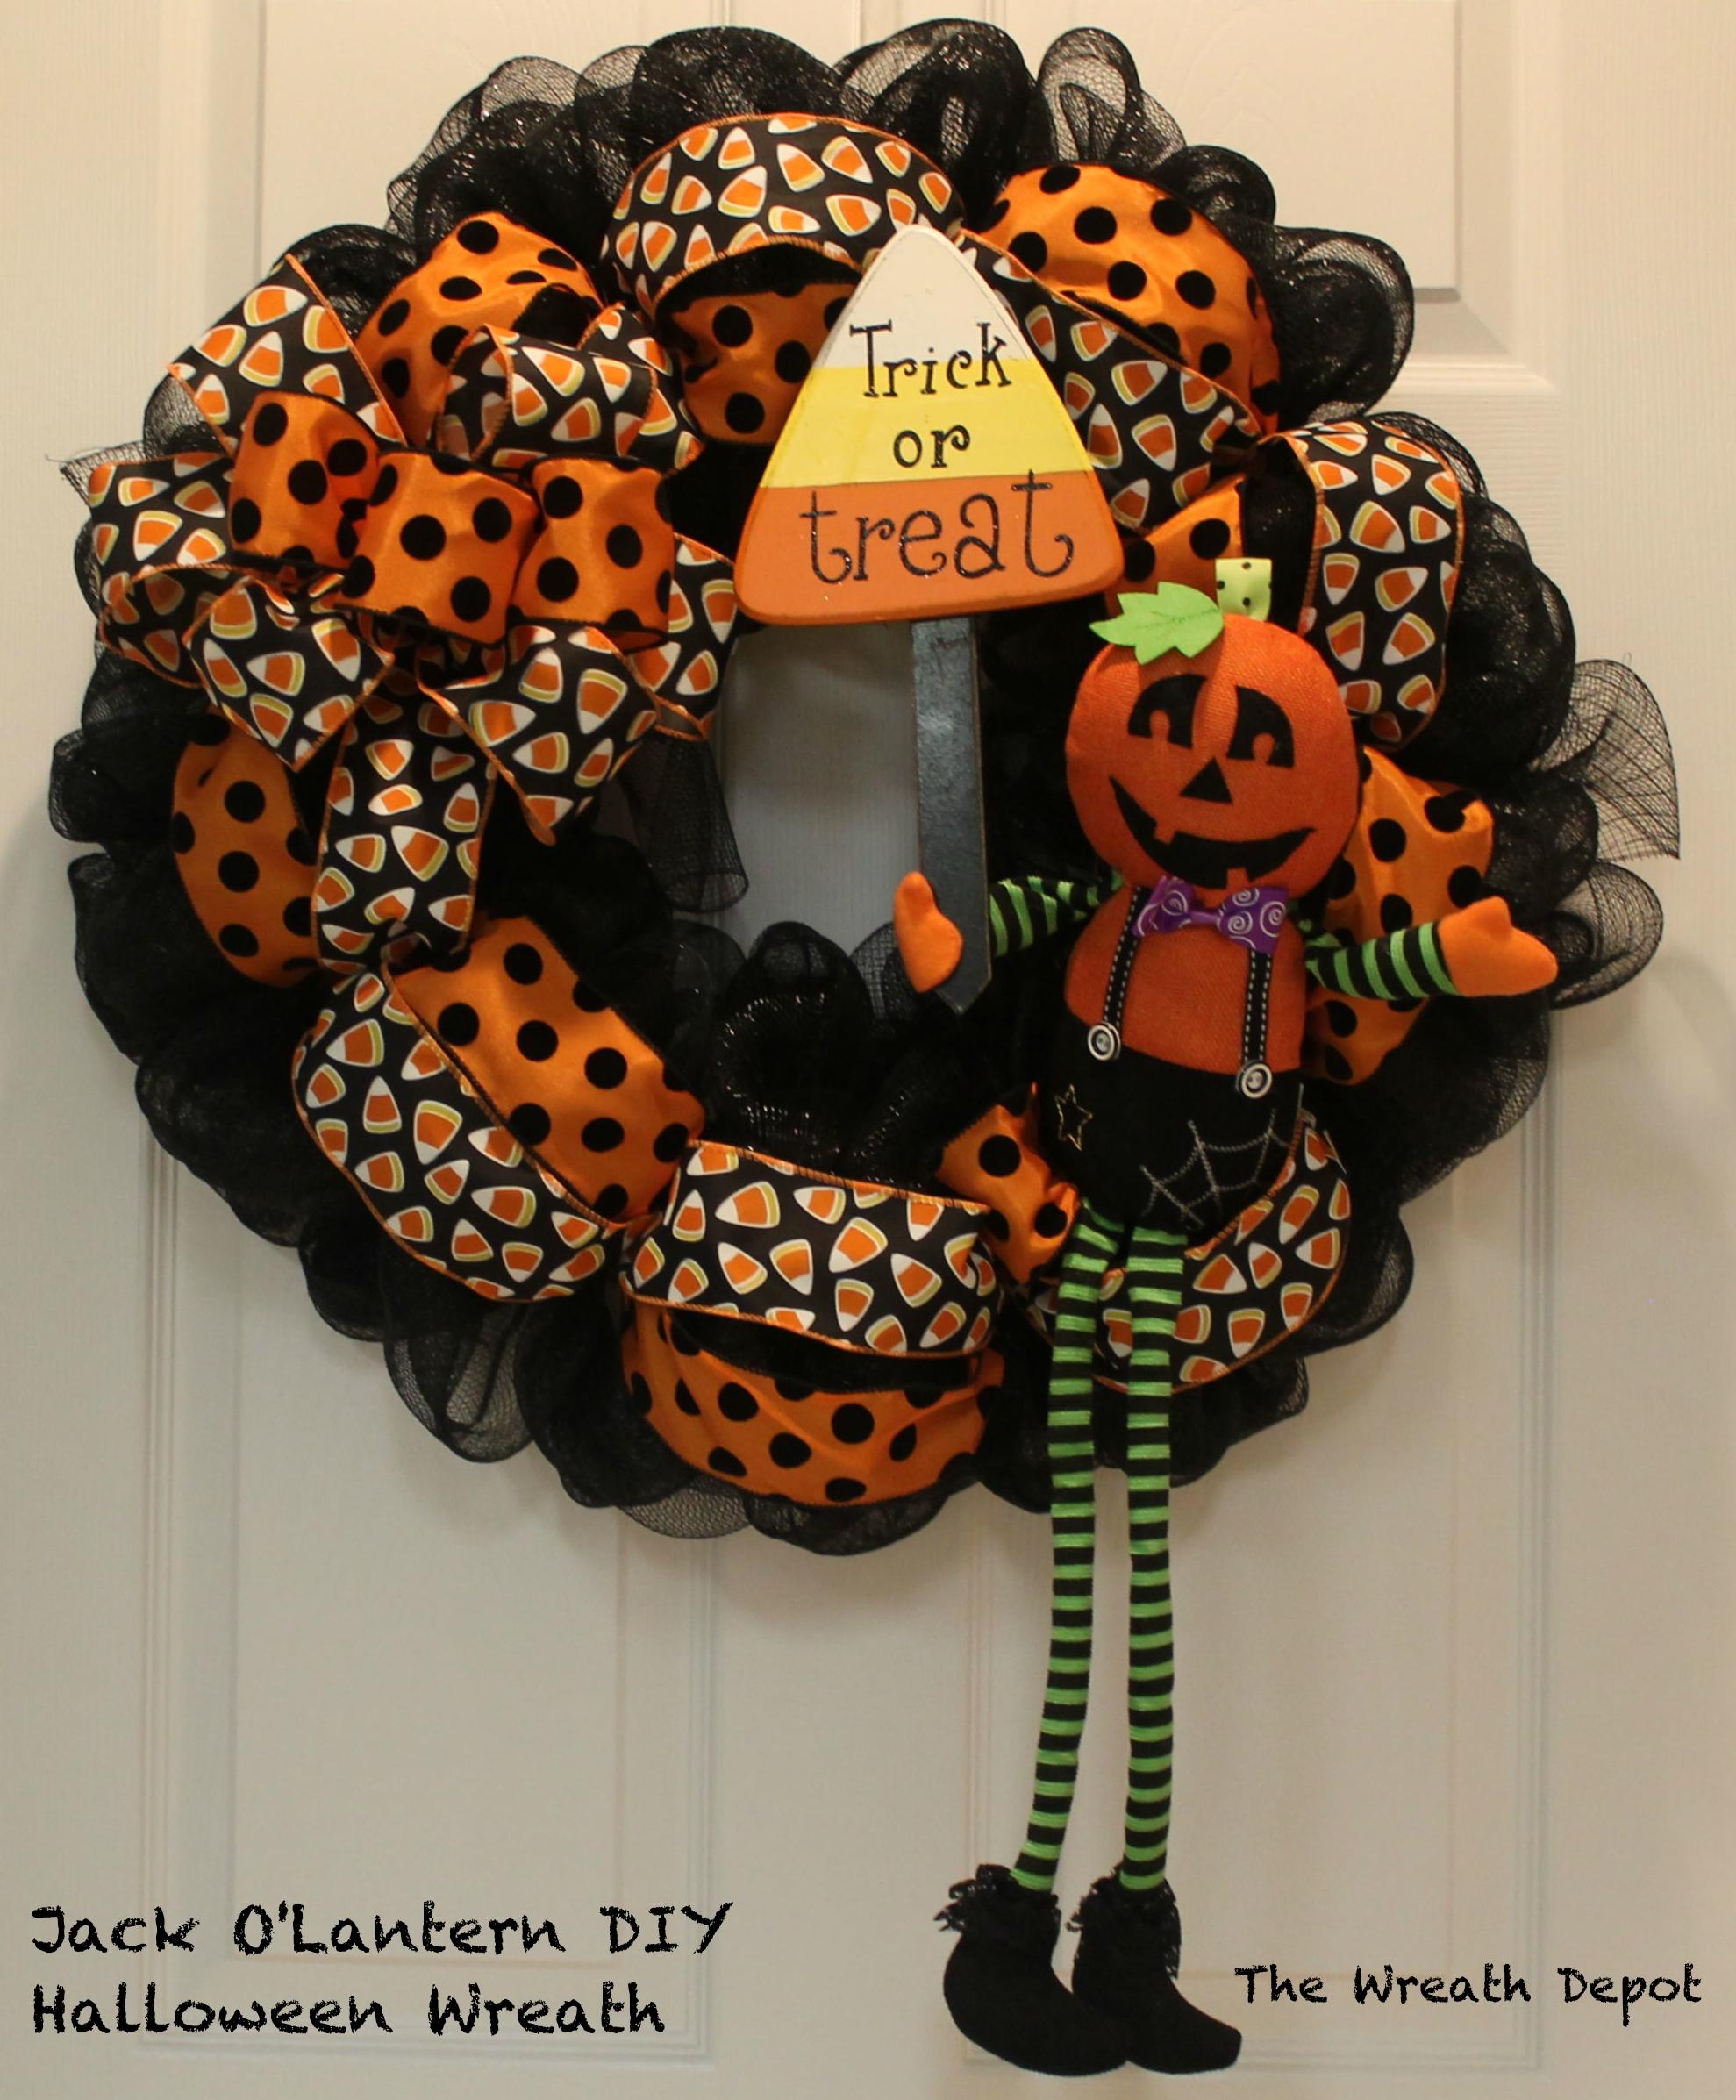 Diy Mesh Waving Jack O Lantern Halloween Wreath The Wreath Depot